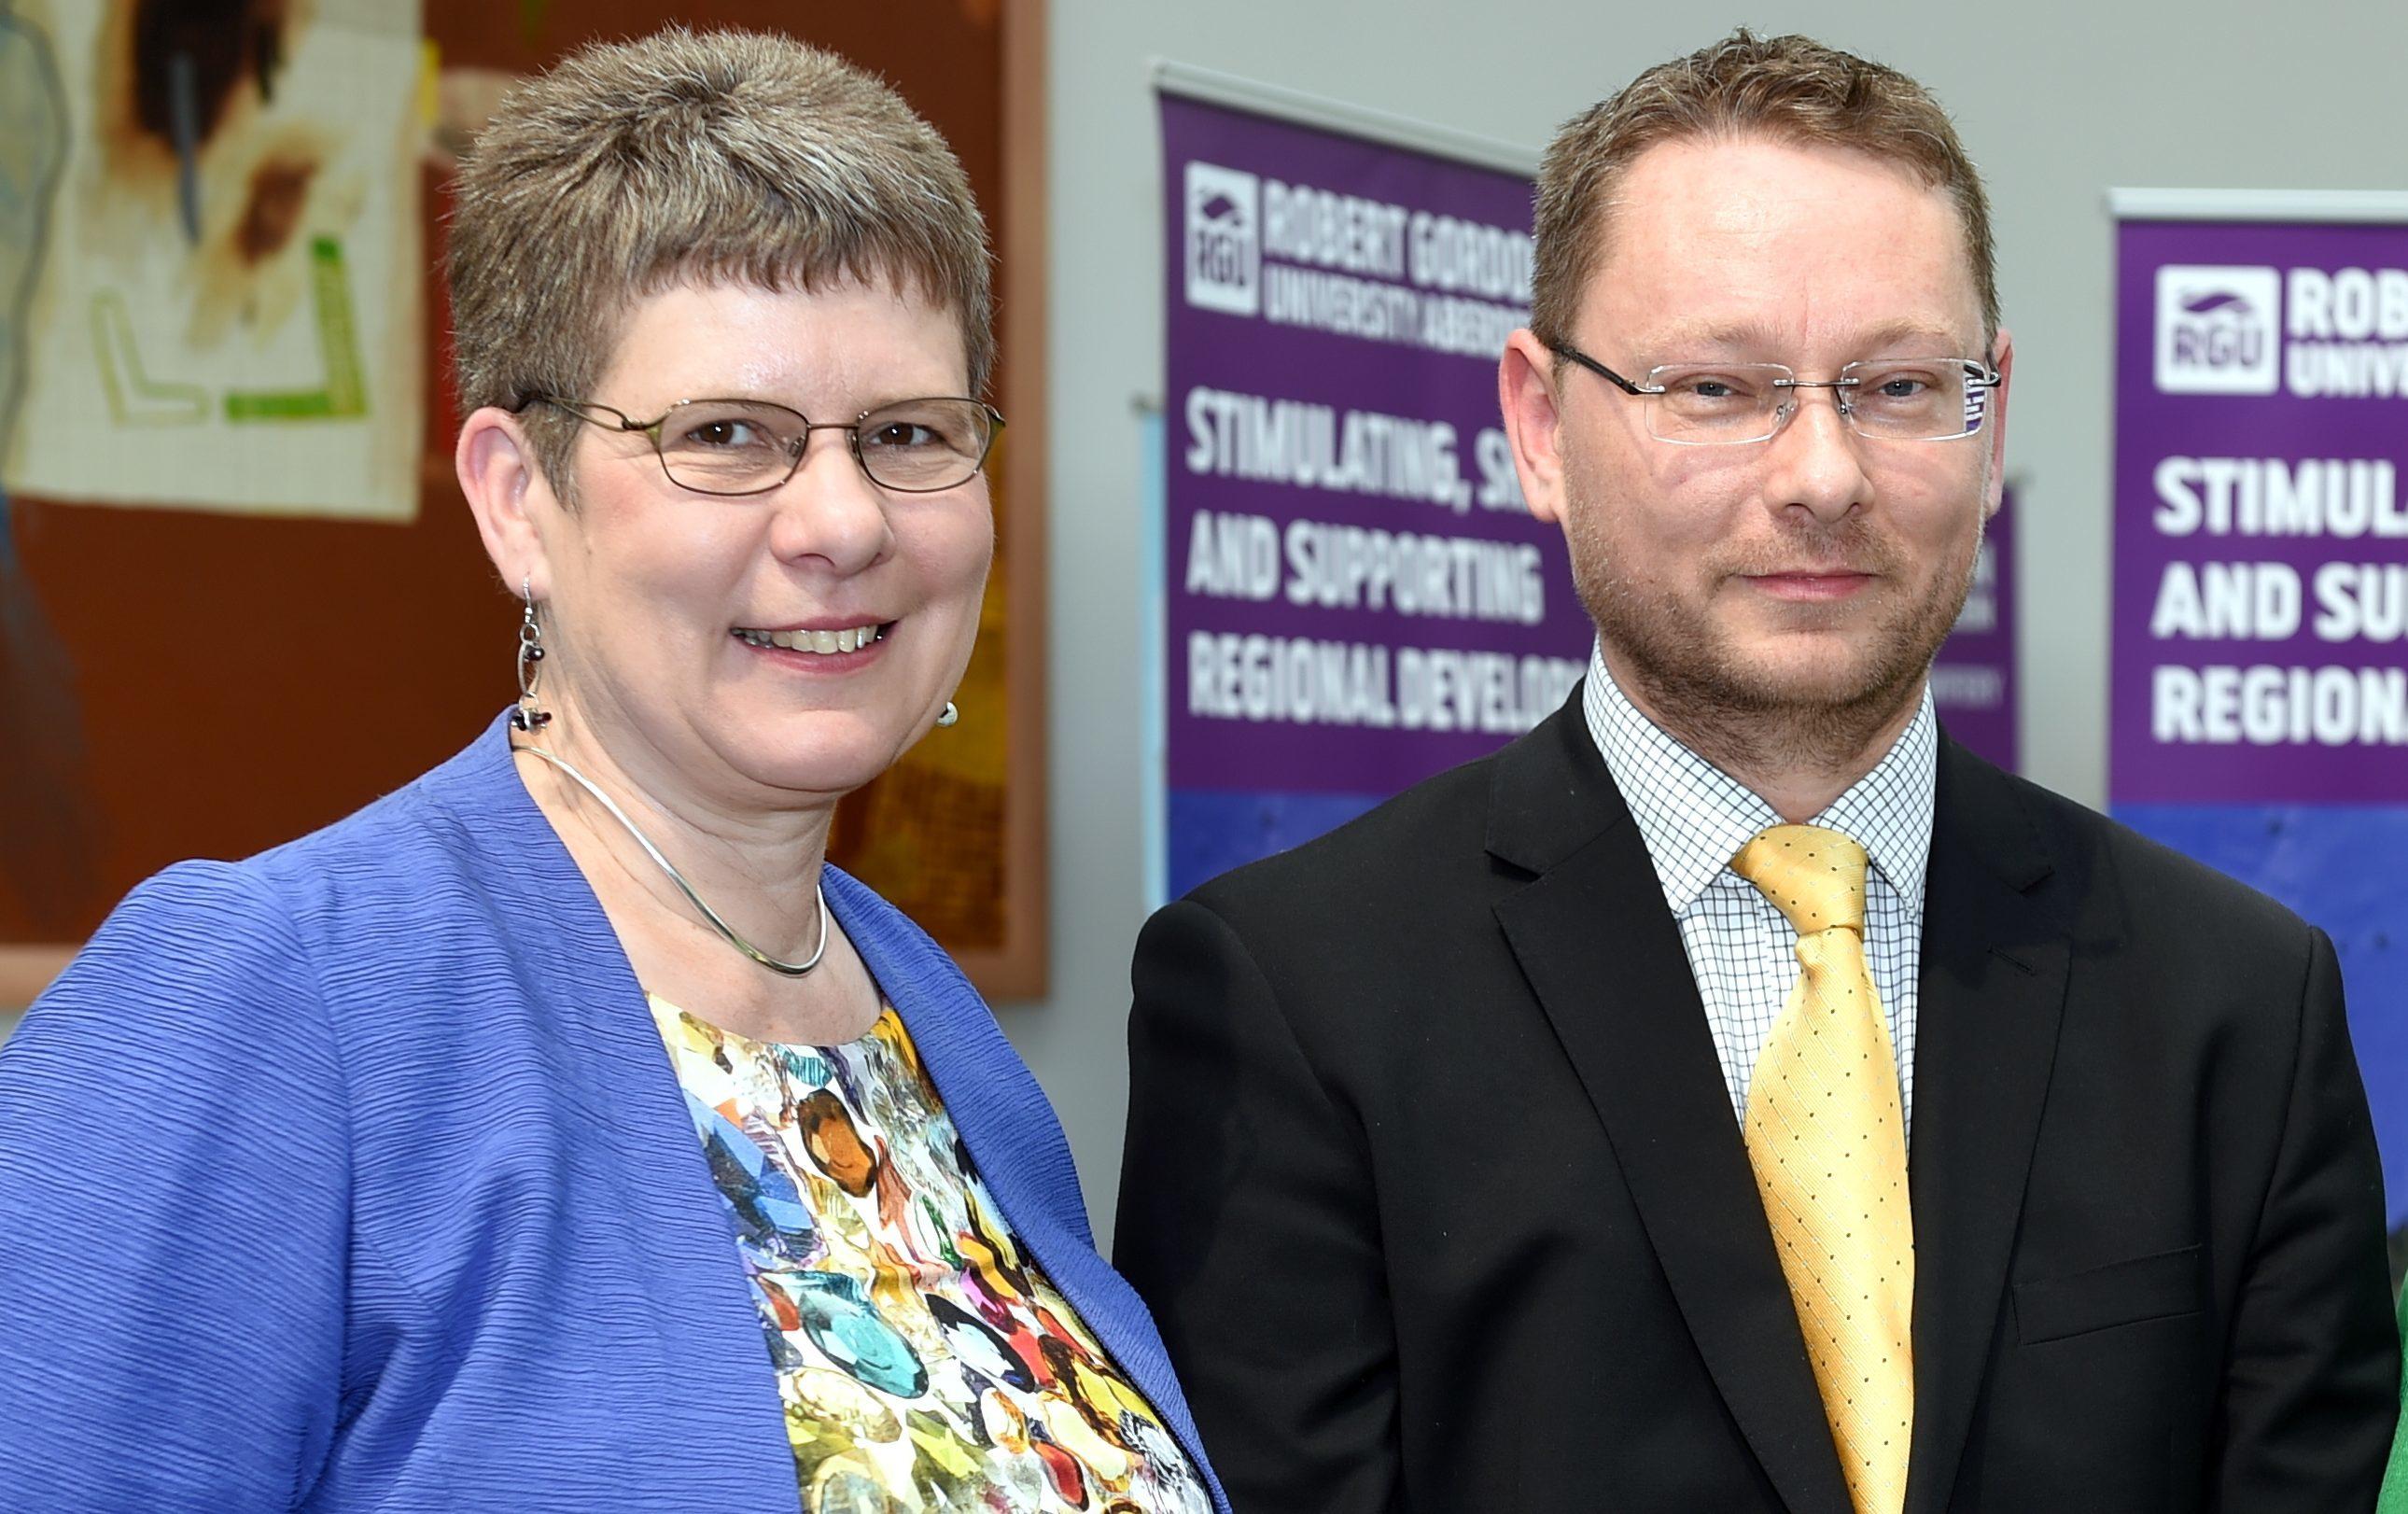 Cllr Alison Evison will work alongside Cllr Richard Thomson at Aberdeenshire Council.